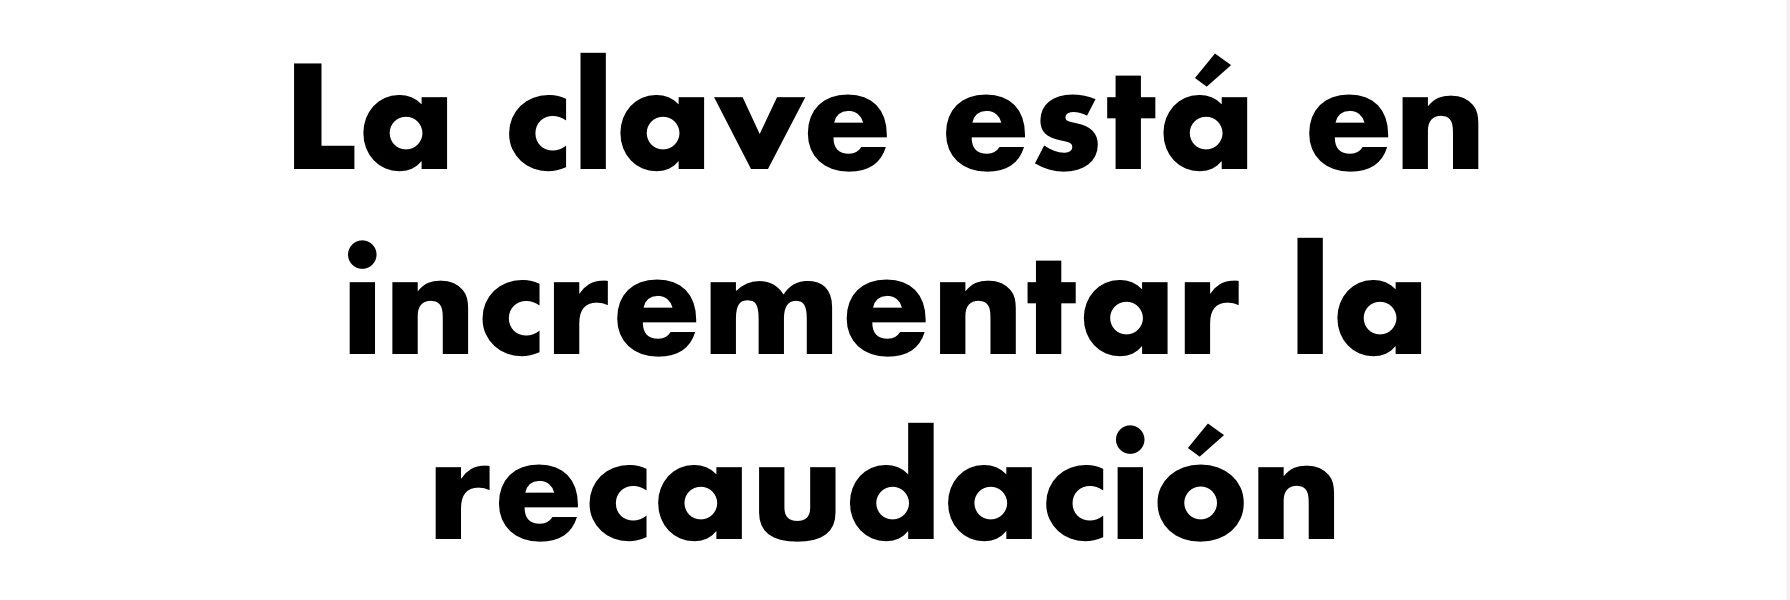 TITULOS DE ETIQUETAS jpg.001.jpeg